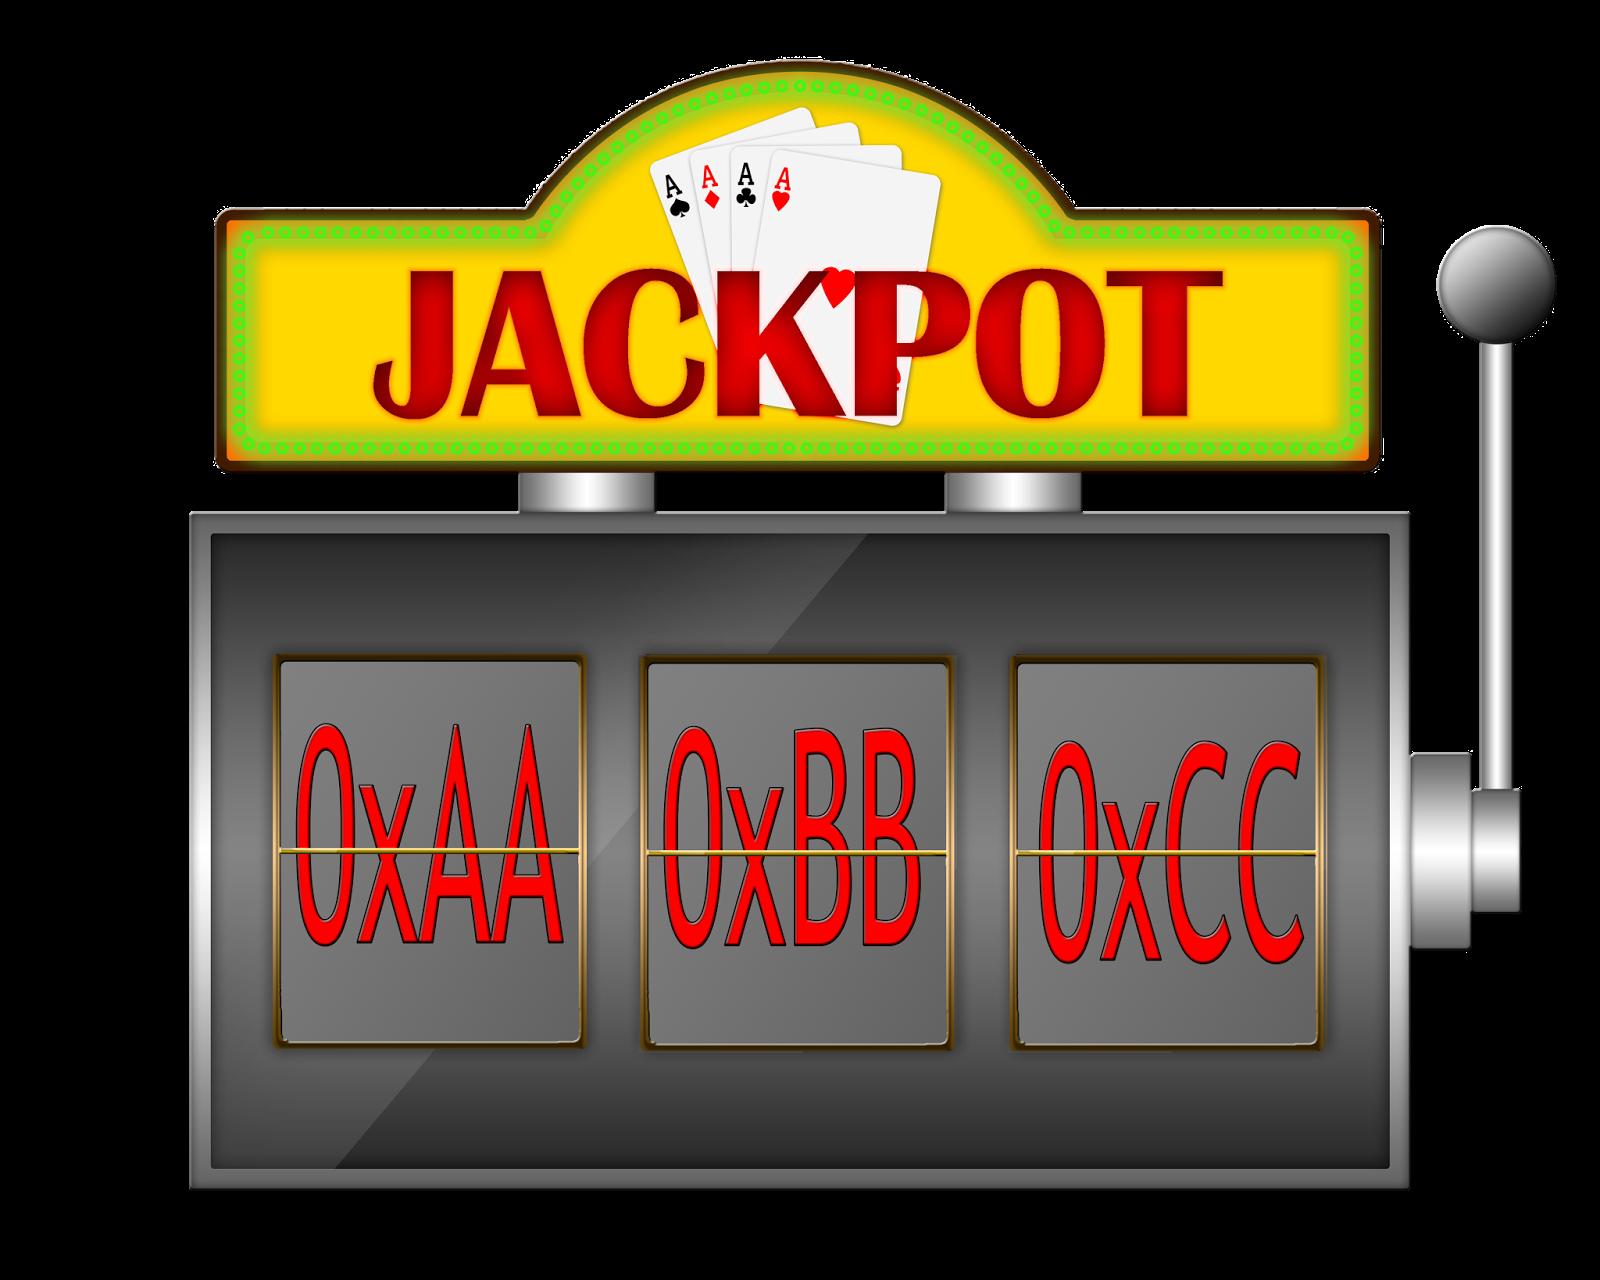 slot machine jackpot sound